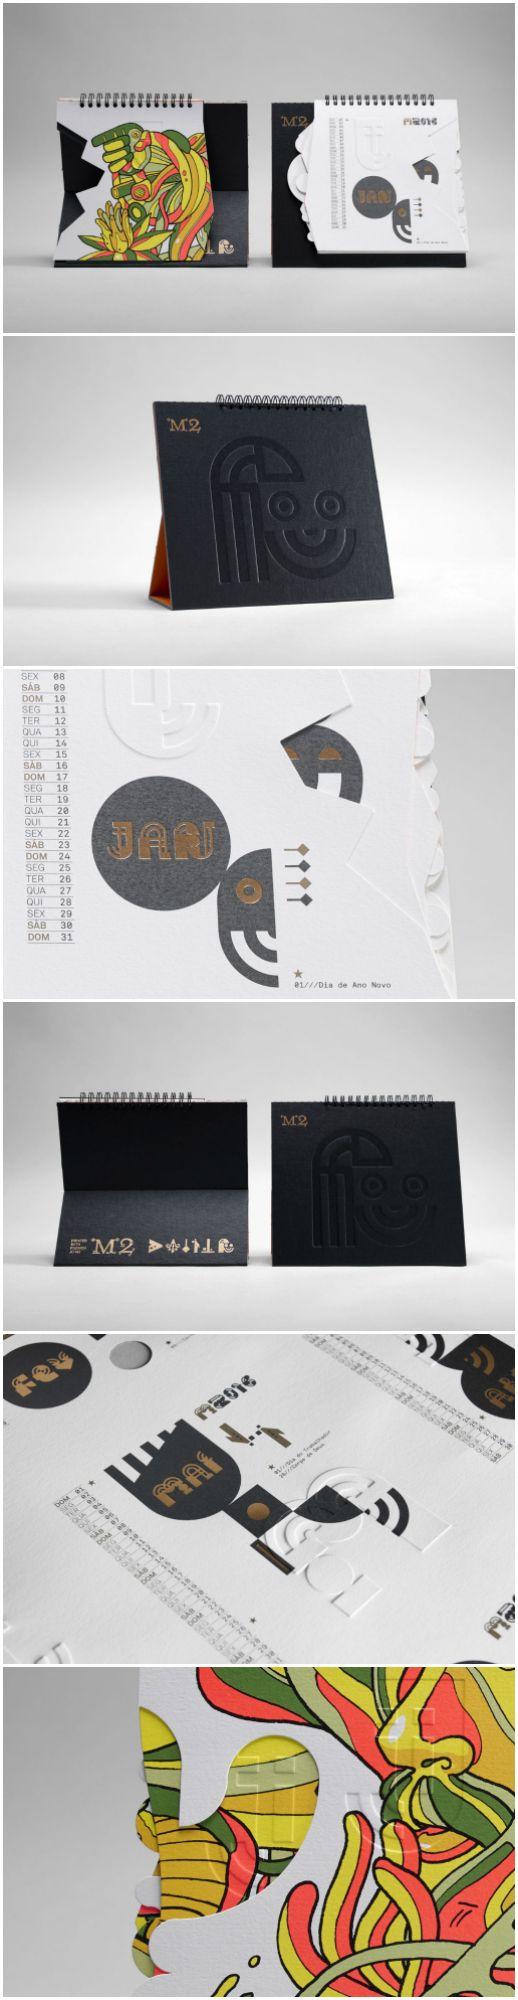 Design Agency:José Mendes Brand / Project Name:M2, artes Gráficas 2016 Desk Calendar Location:Portugal Category: #promotional #calendar